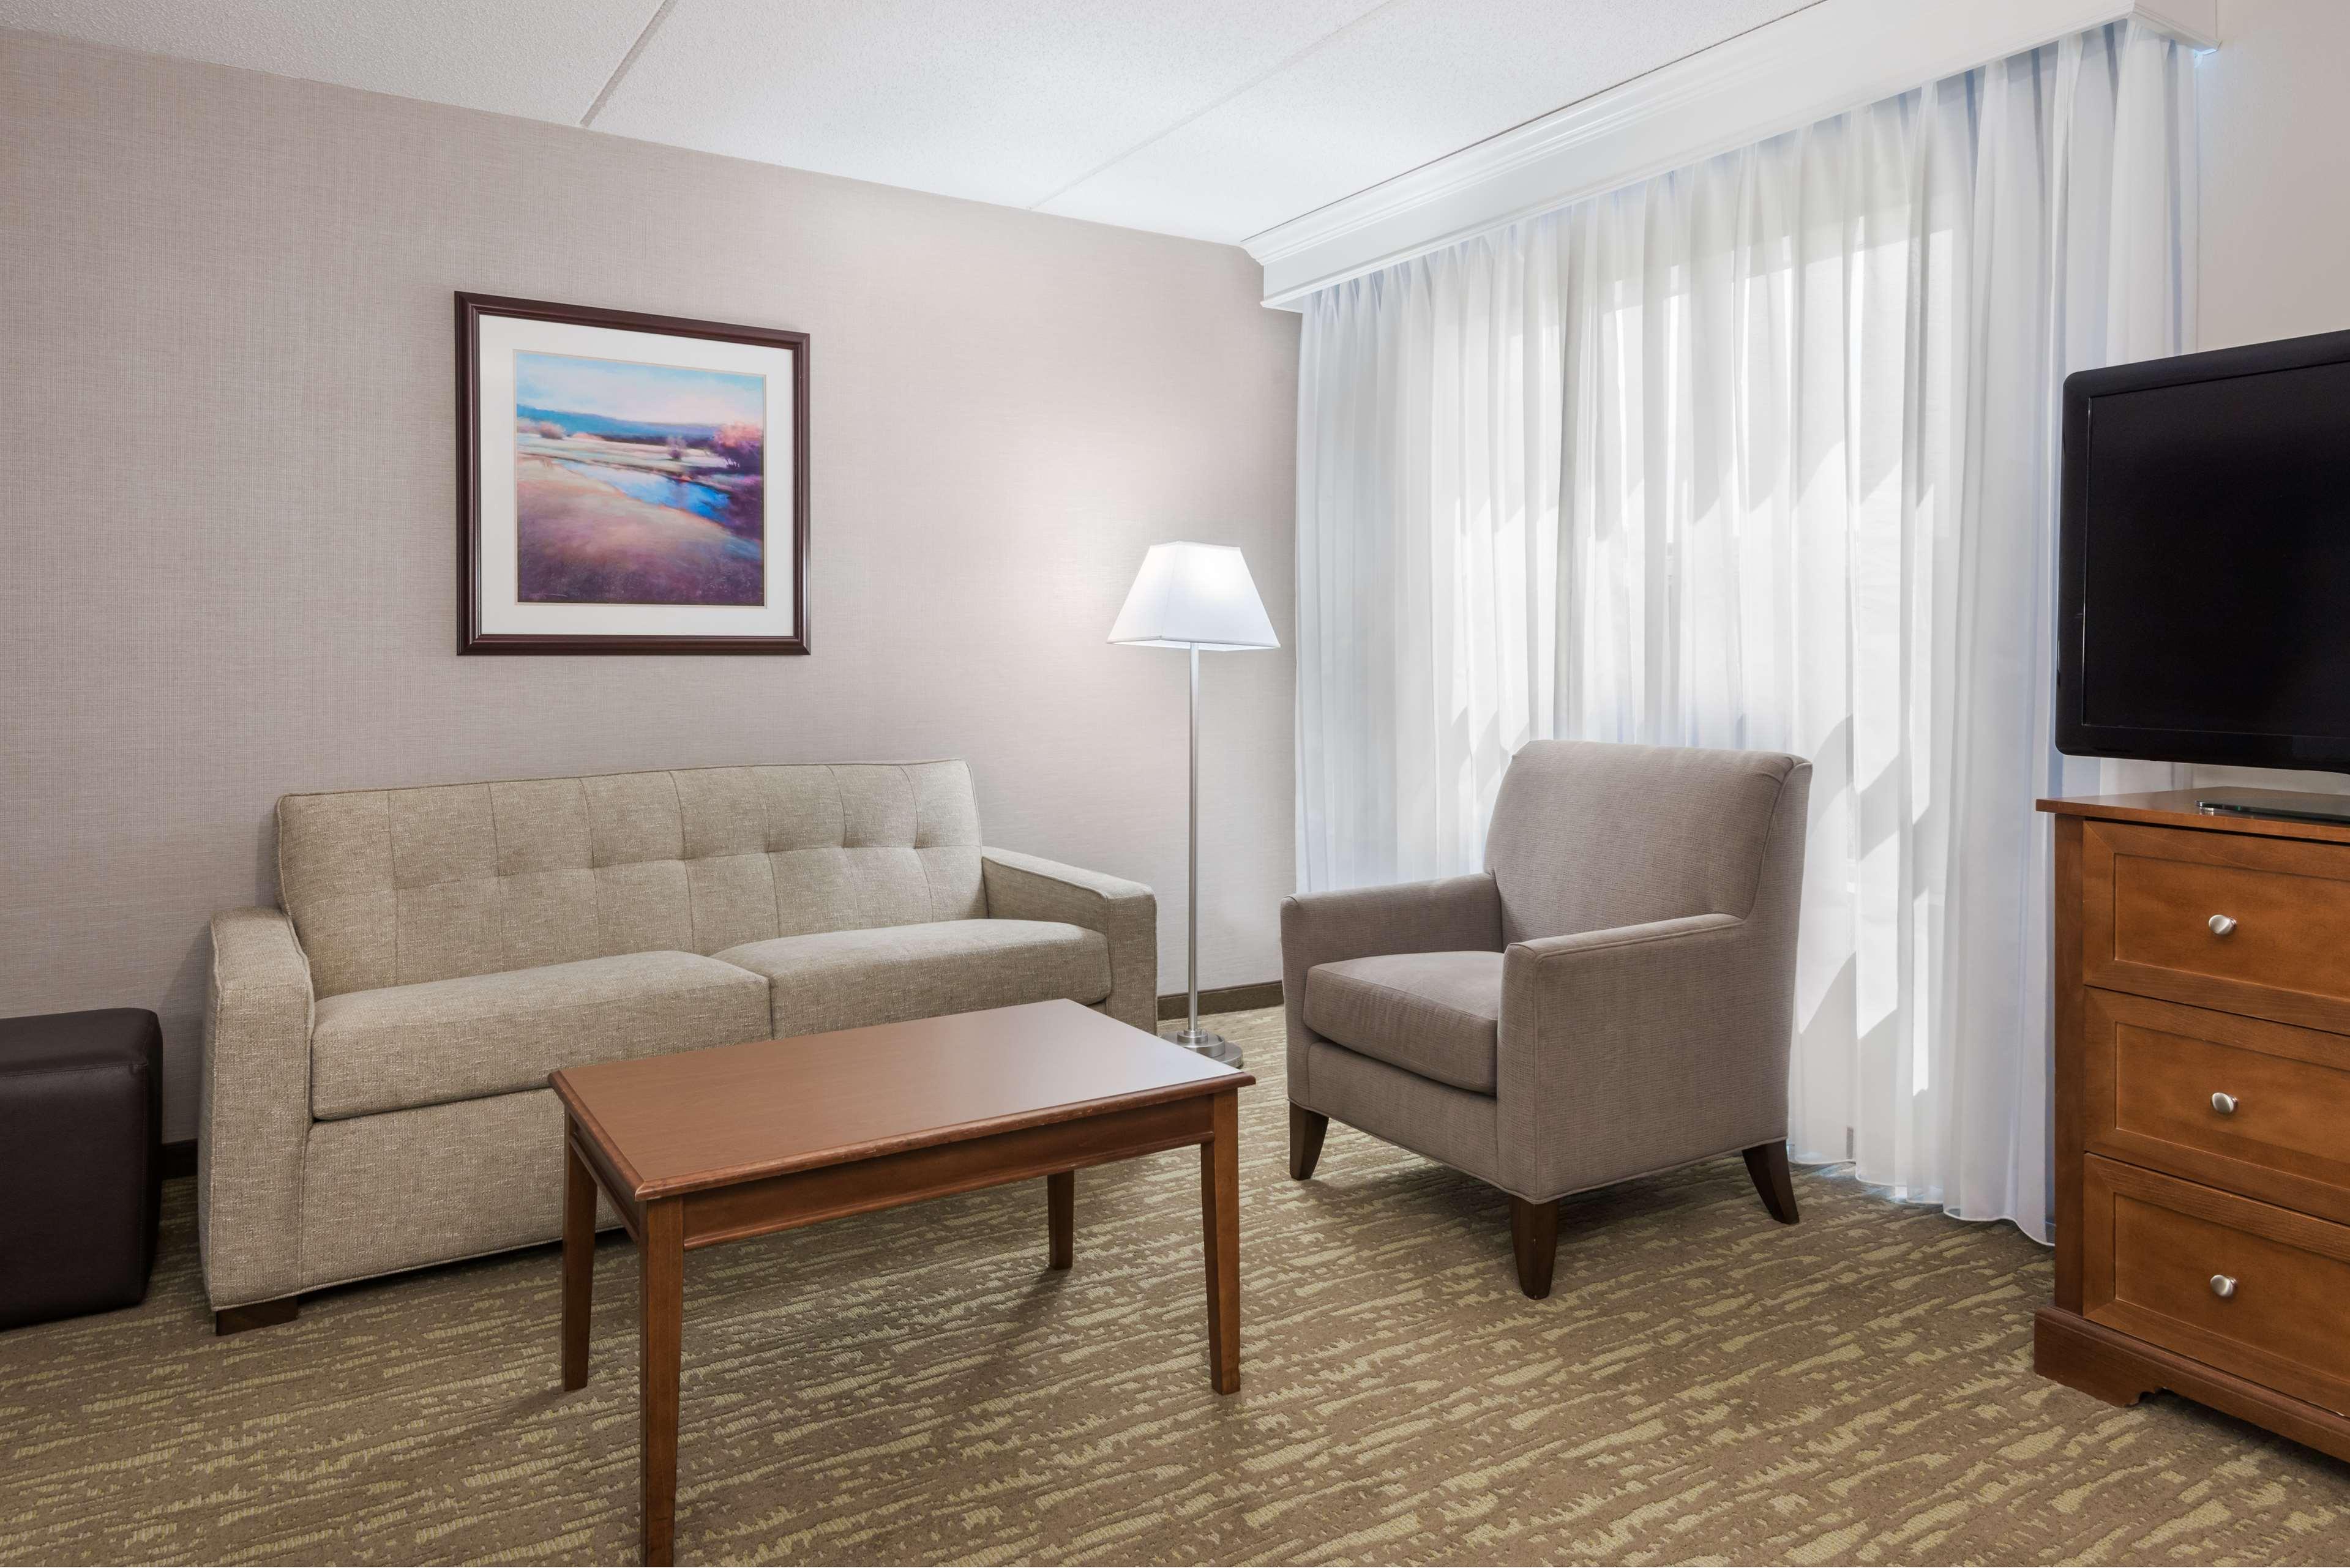 Homewood Suites by Hilton Holyoke-Springfield/North image 18